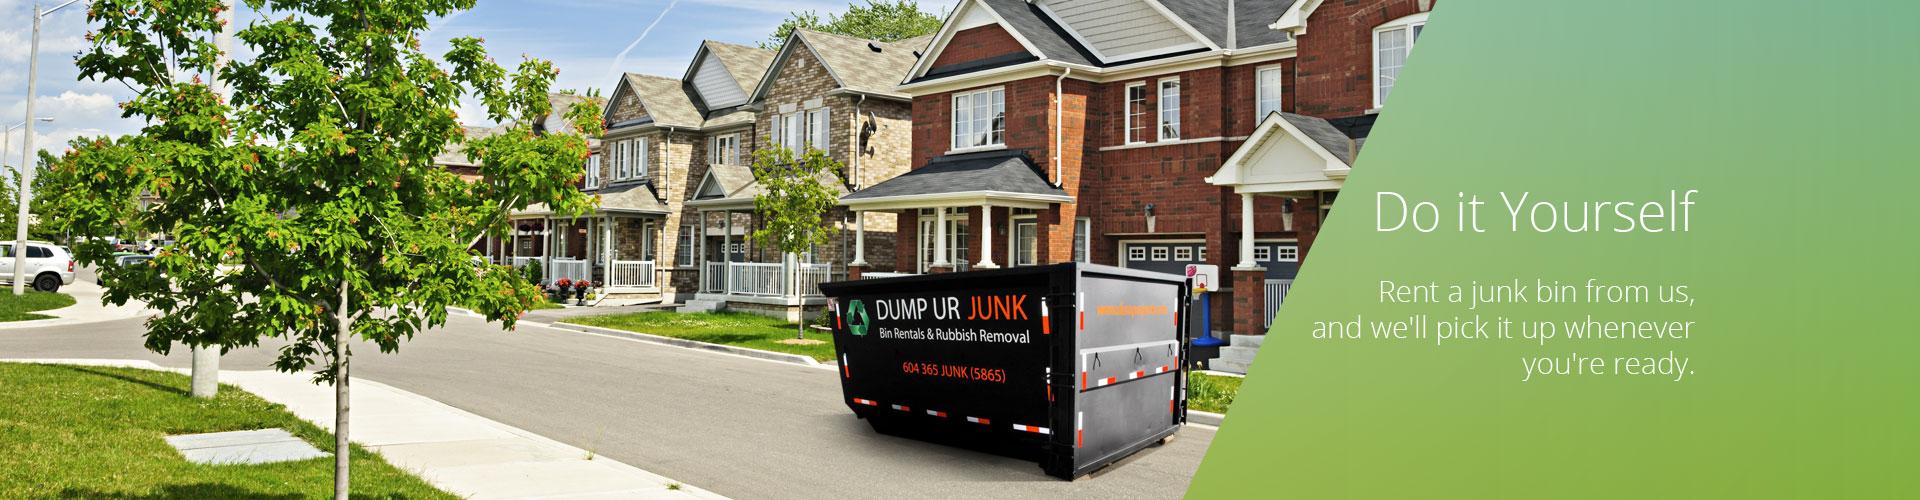 Dump Ur Junk - Do It Yourself